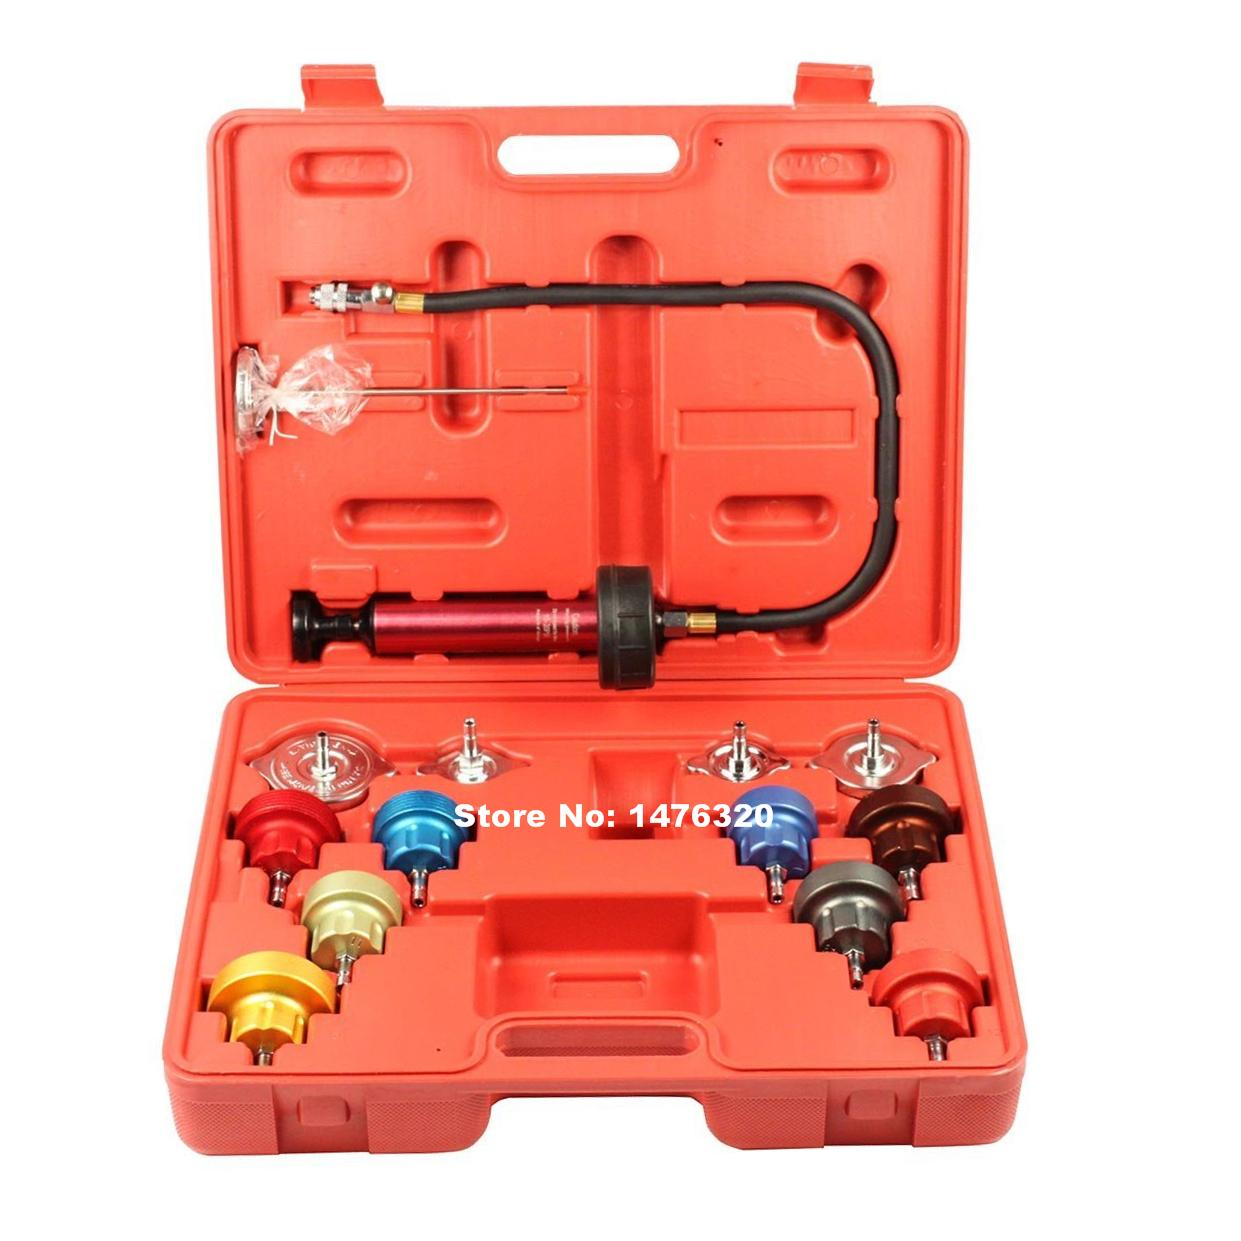 Automotive Radiator Pump Pressure Cooling Leak Diagnostic Tester Checker Kit AT2174